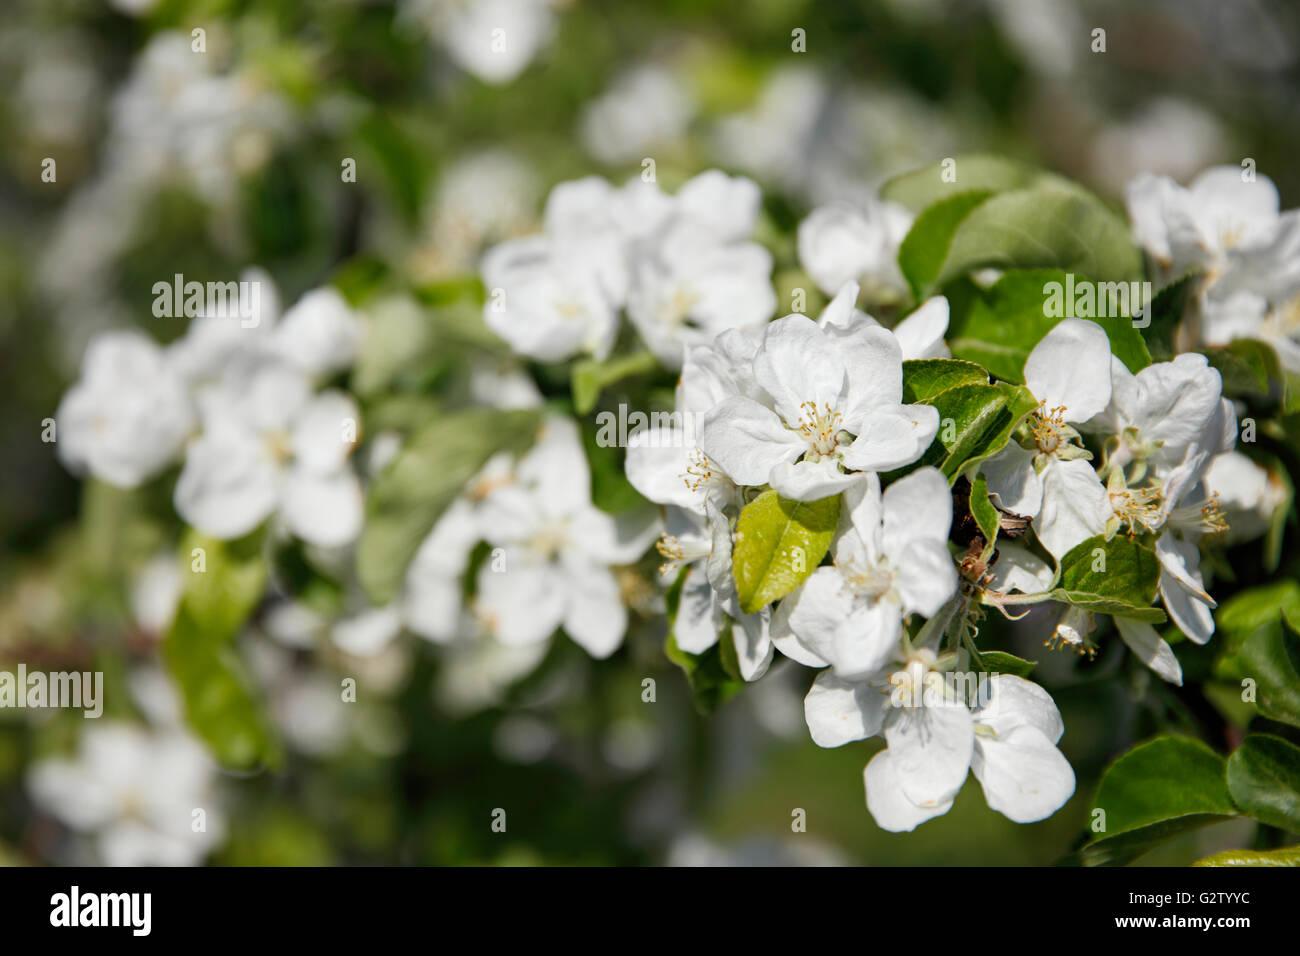 Zweig der Apfelbaum in voller Blüte. Kolomenskoye Museums-Reserve, Moskau, Russland. Stockbild